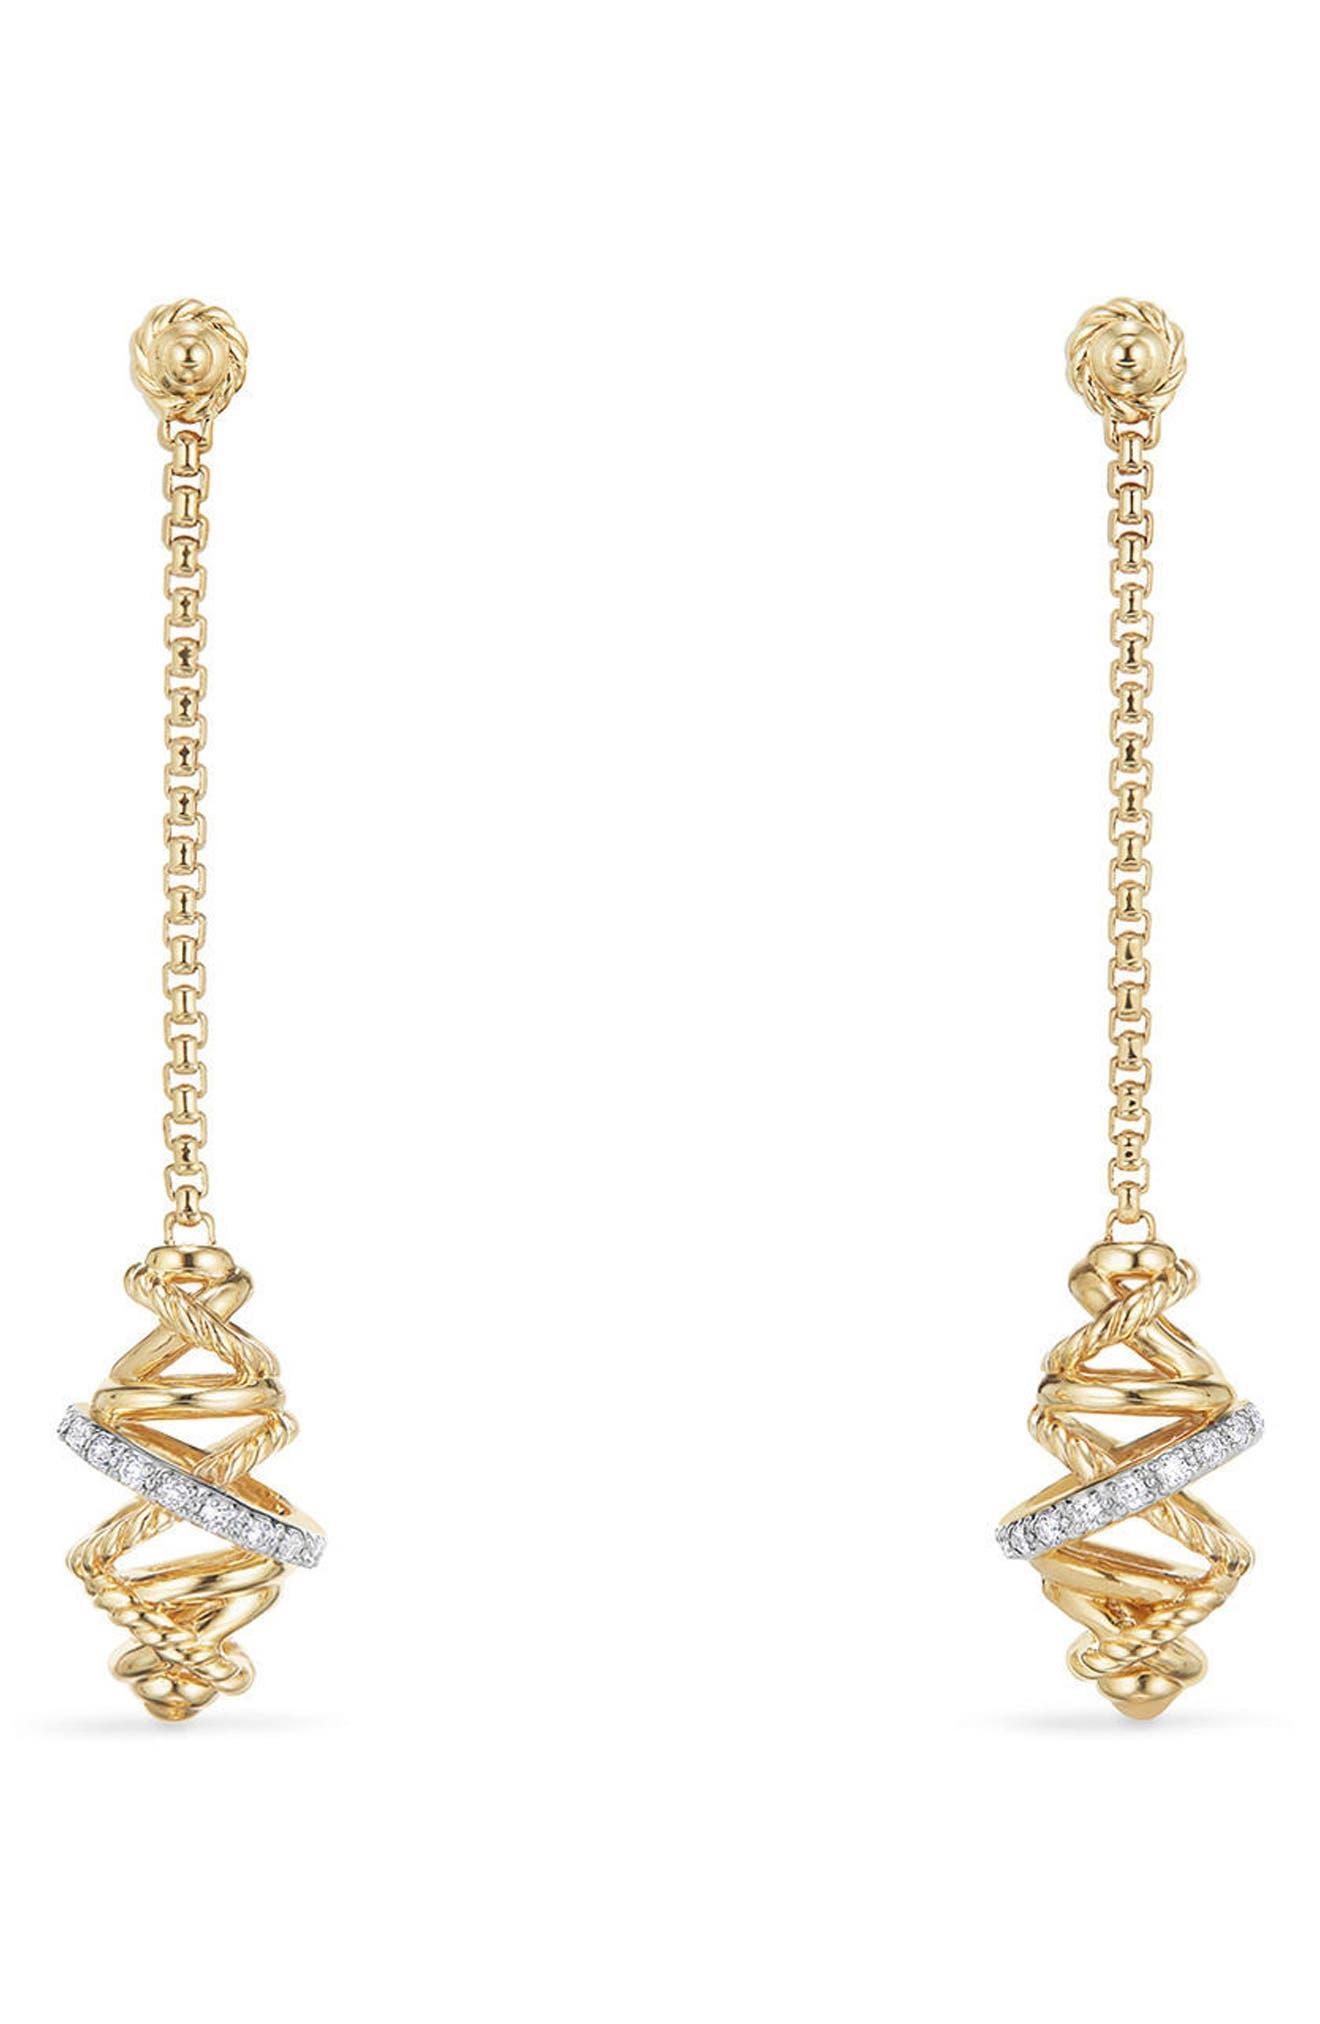 Main Image - David Yurman Crossover Chain Drop Earrings with Diamonds in 18K Gold